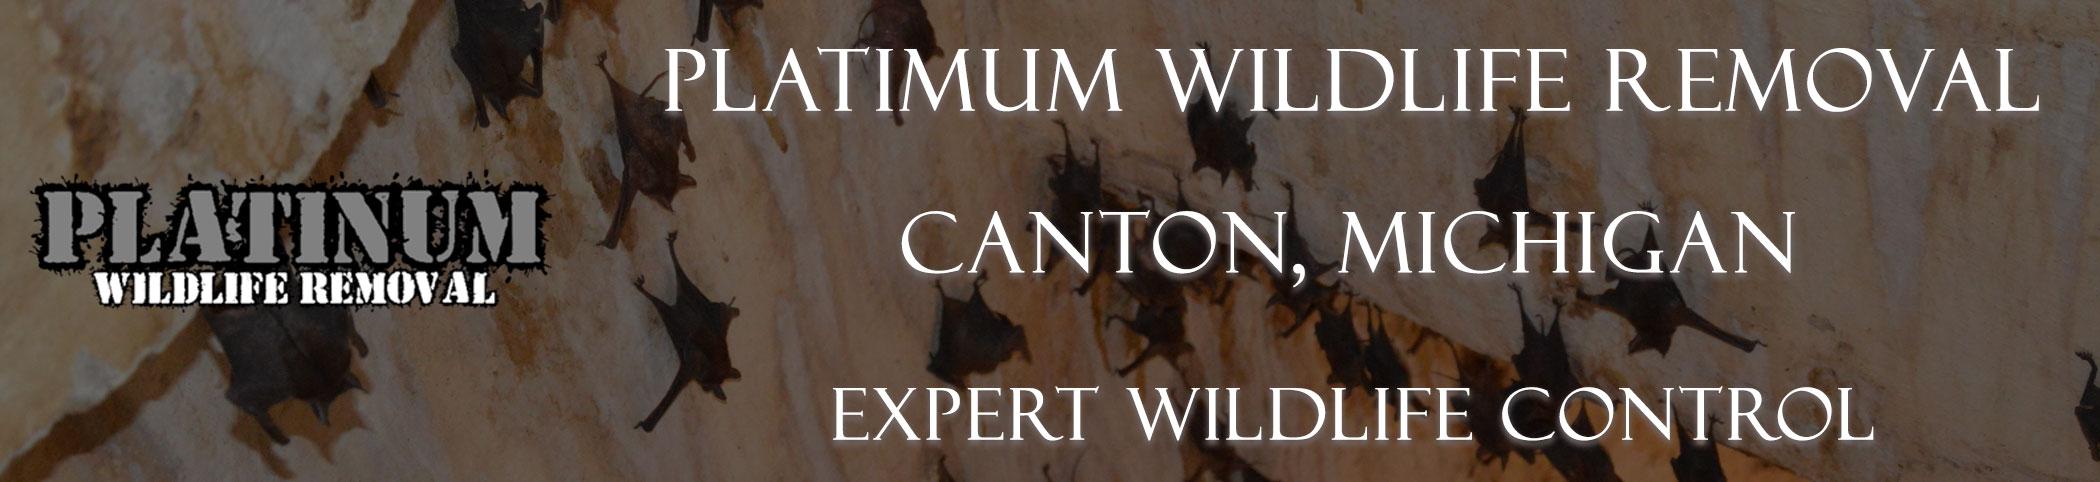 Canton-Platinum-Wildlife-Removal-michgan